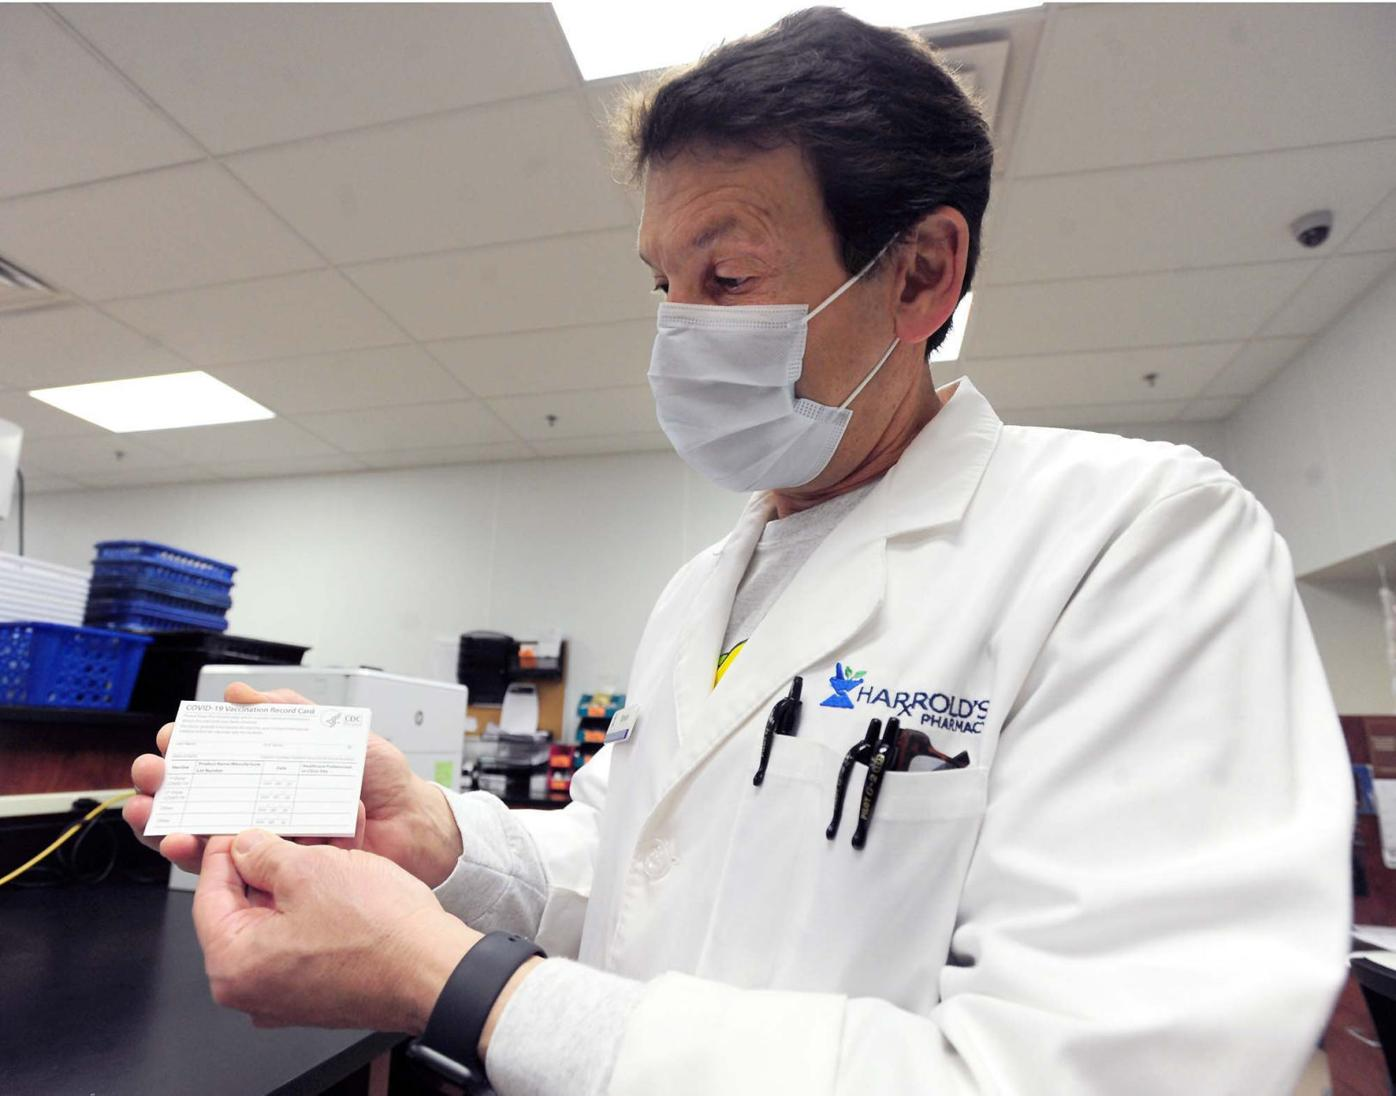 cv041221vaccinationcardp3